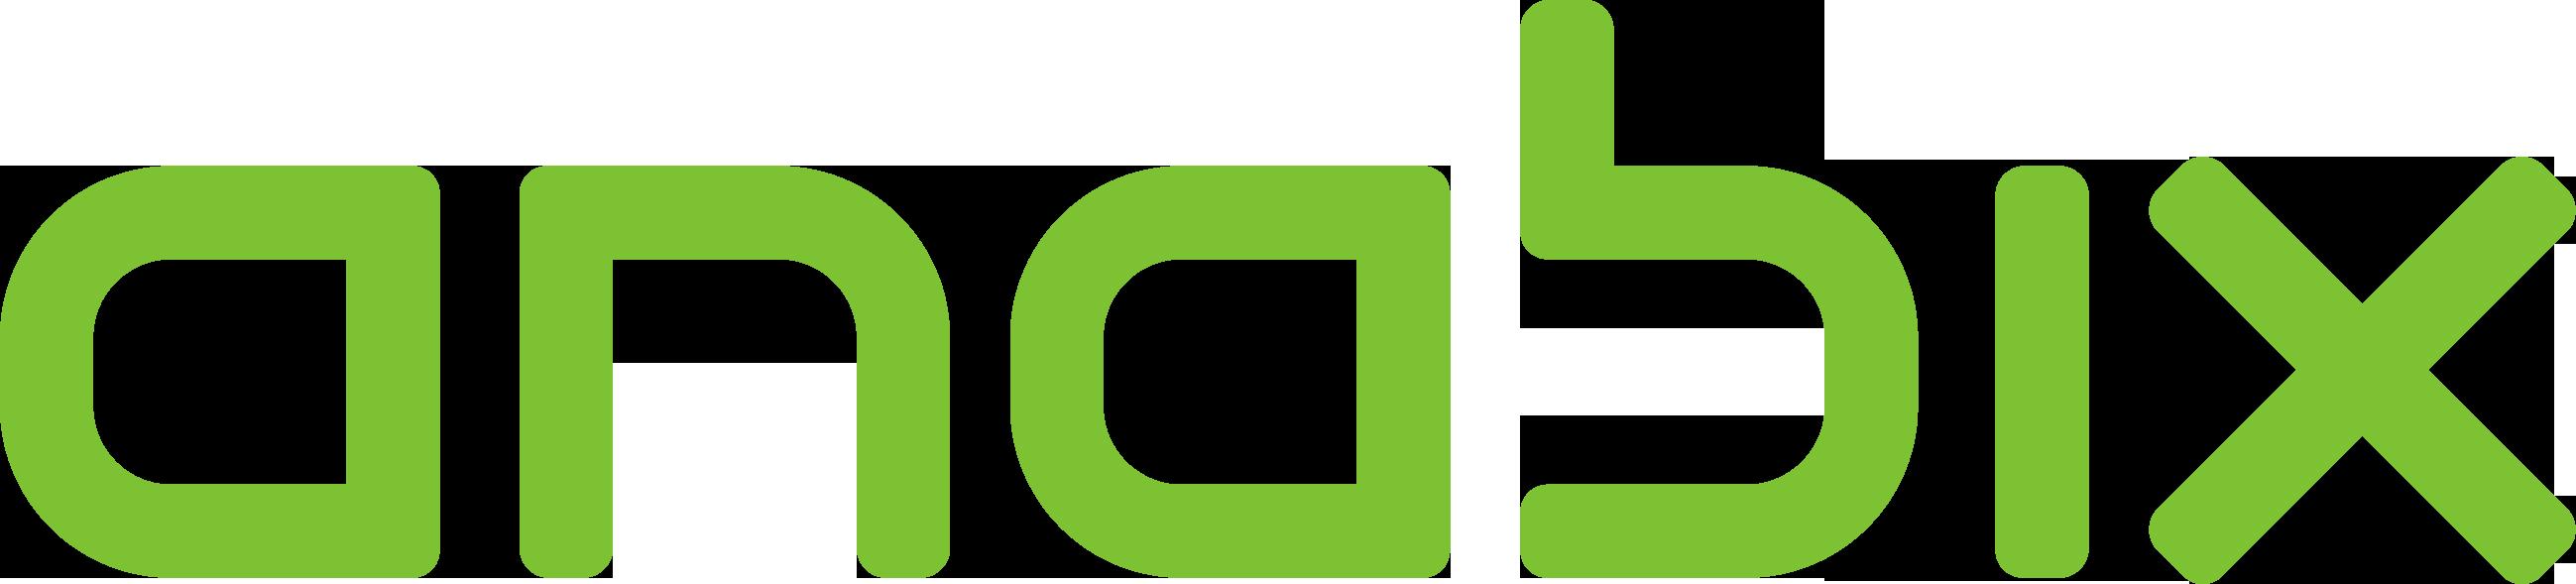 Link to Anabix CRM